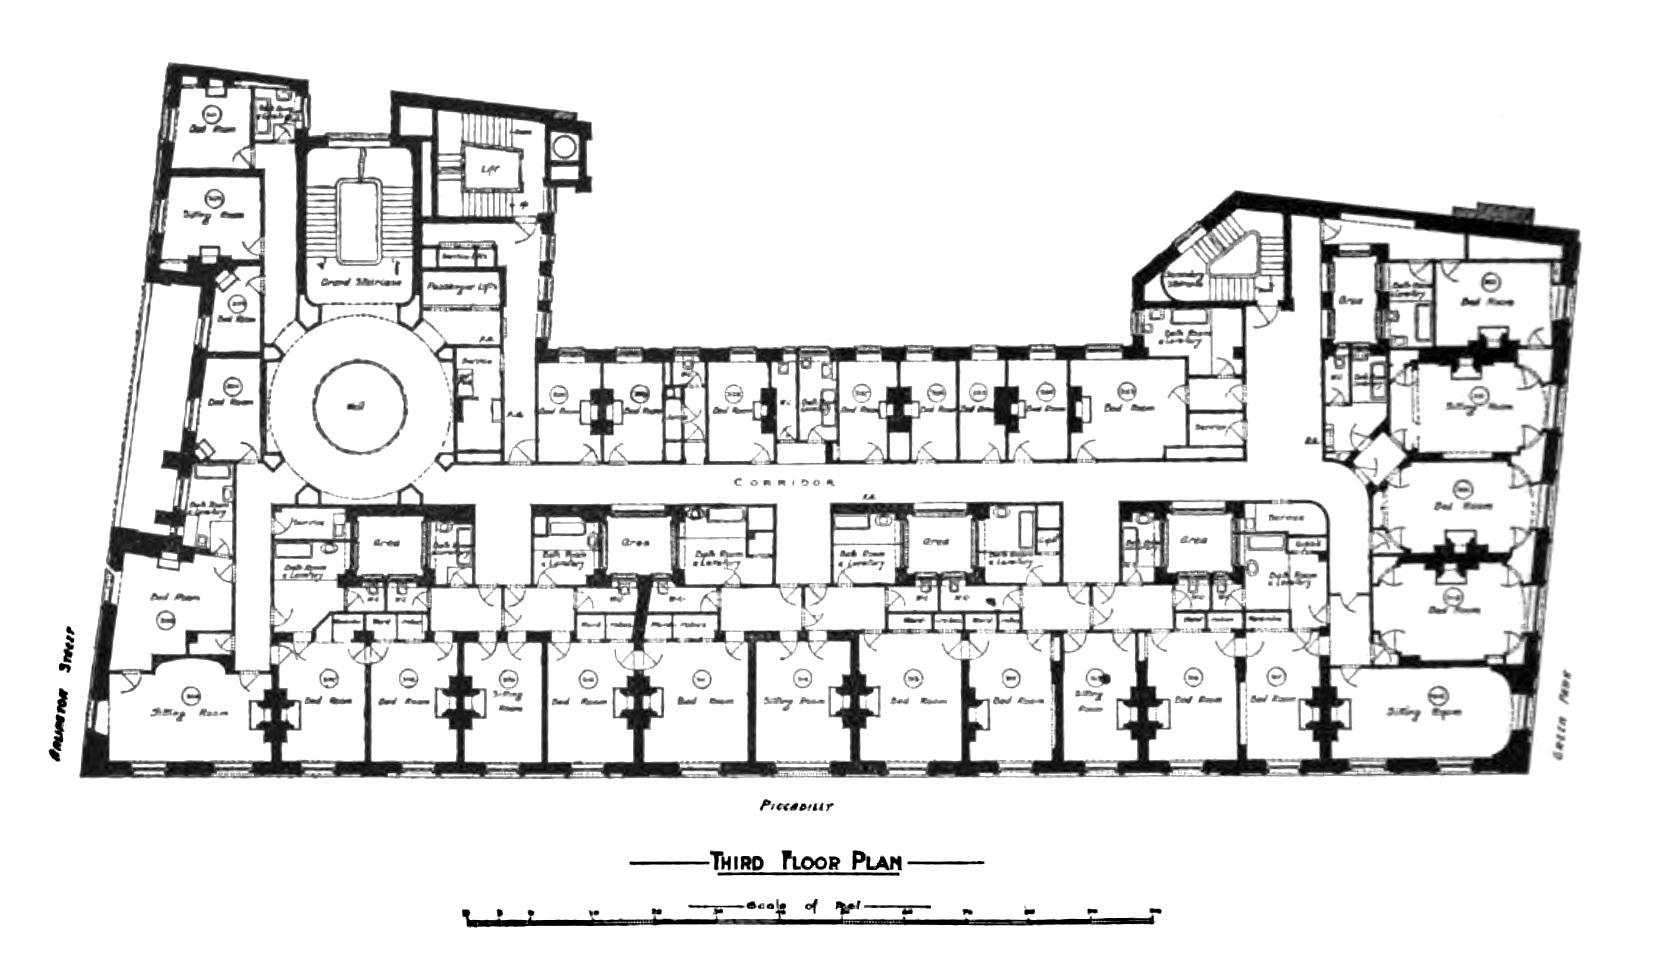 FileRitz London Floor Planjpg Wikimedia Commons